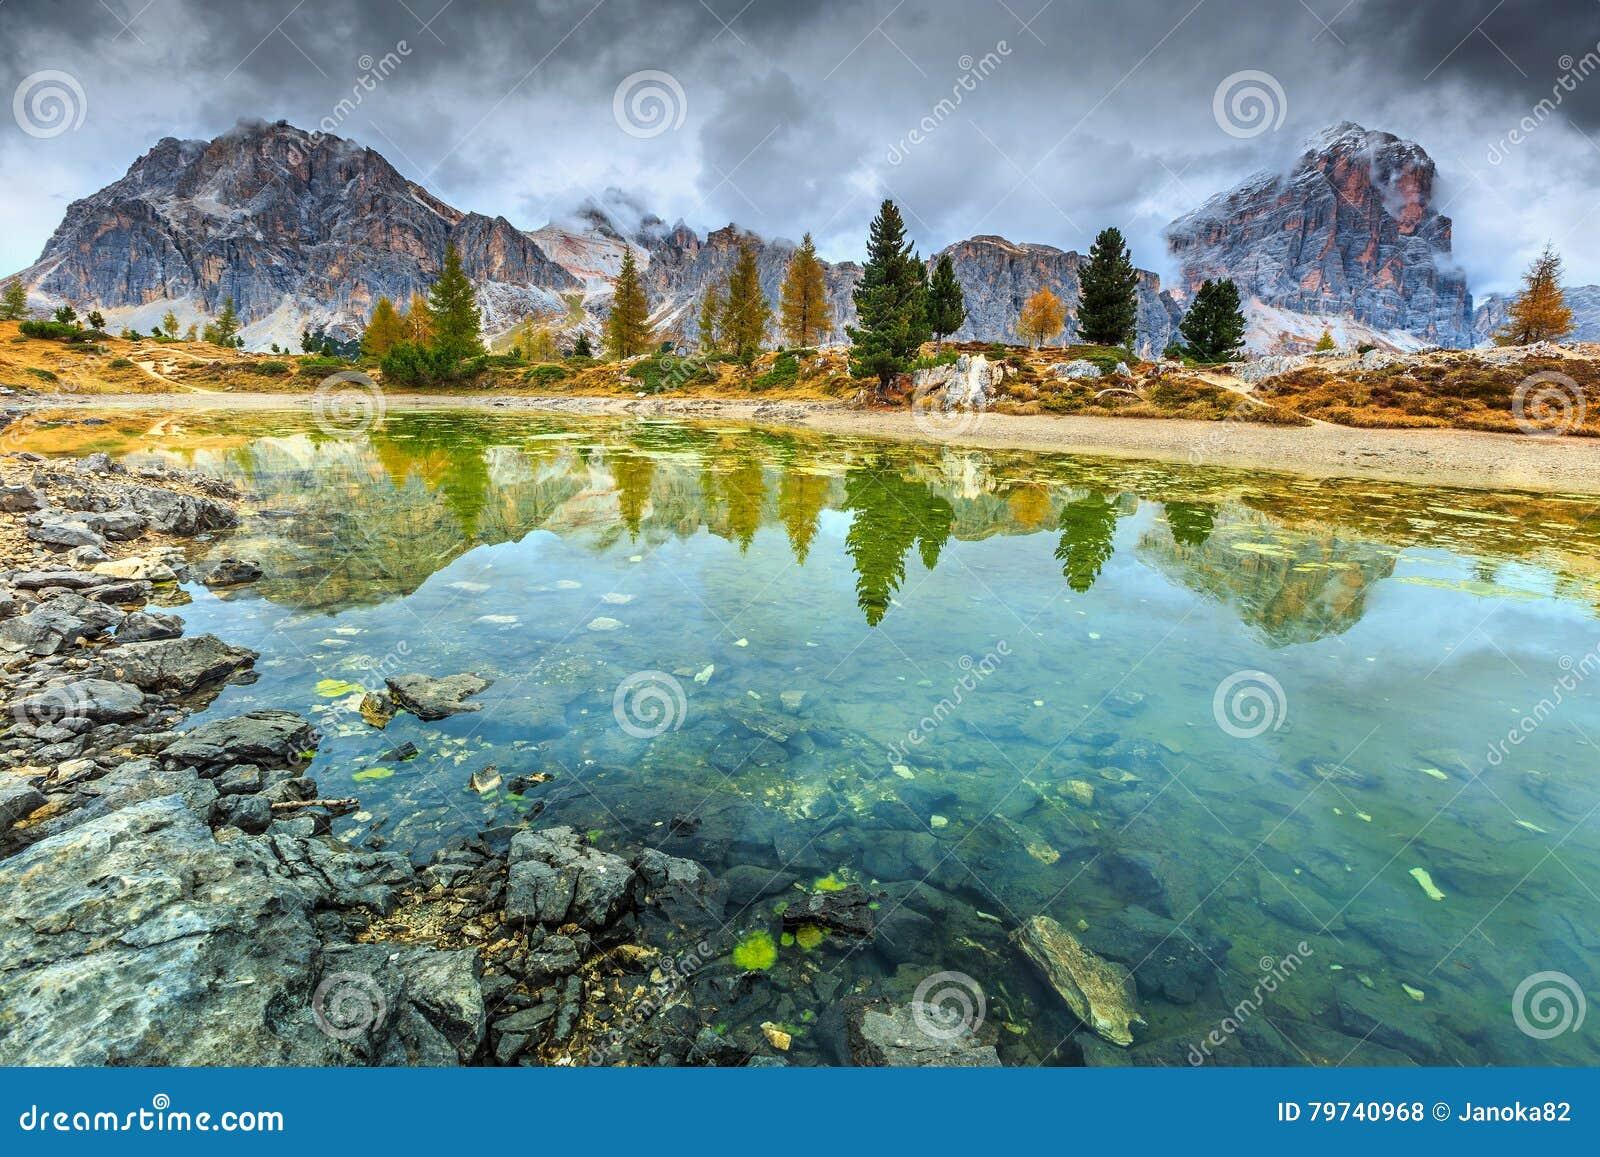 Lago alpino maravilloso con los picos brumosos en fondo, dolomías, Italia